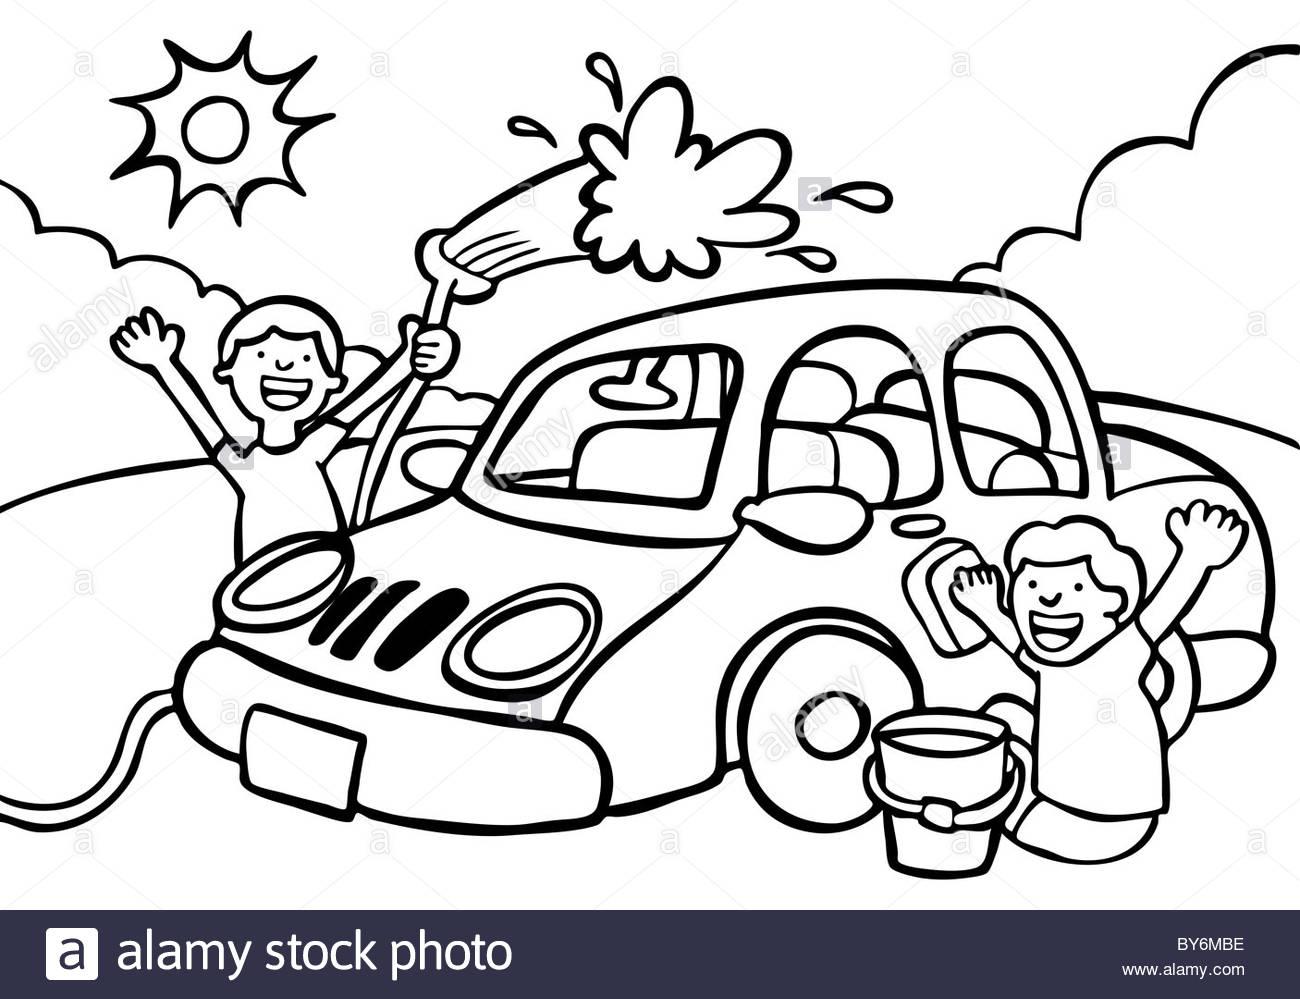 1300x999 Cartoon Image Of Two Kids Washing A Car